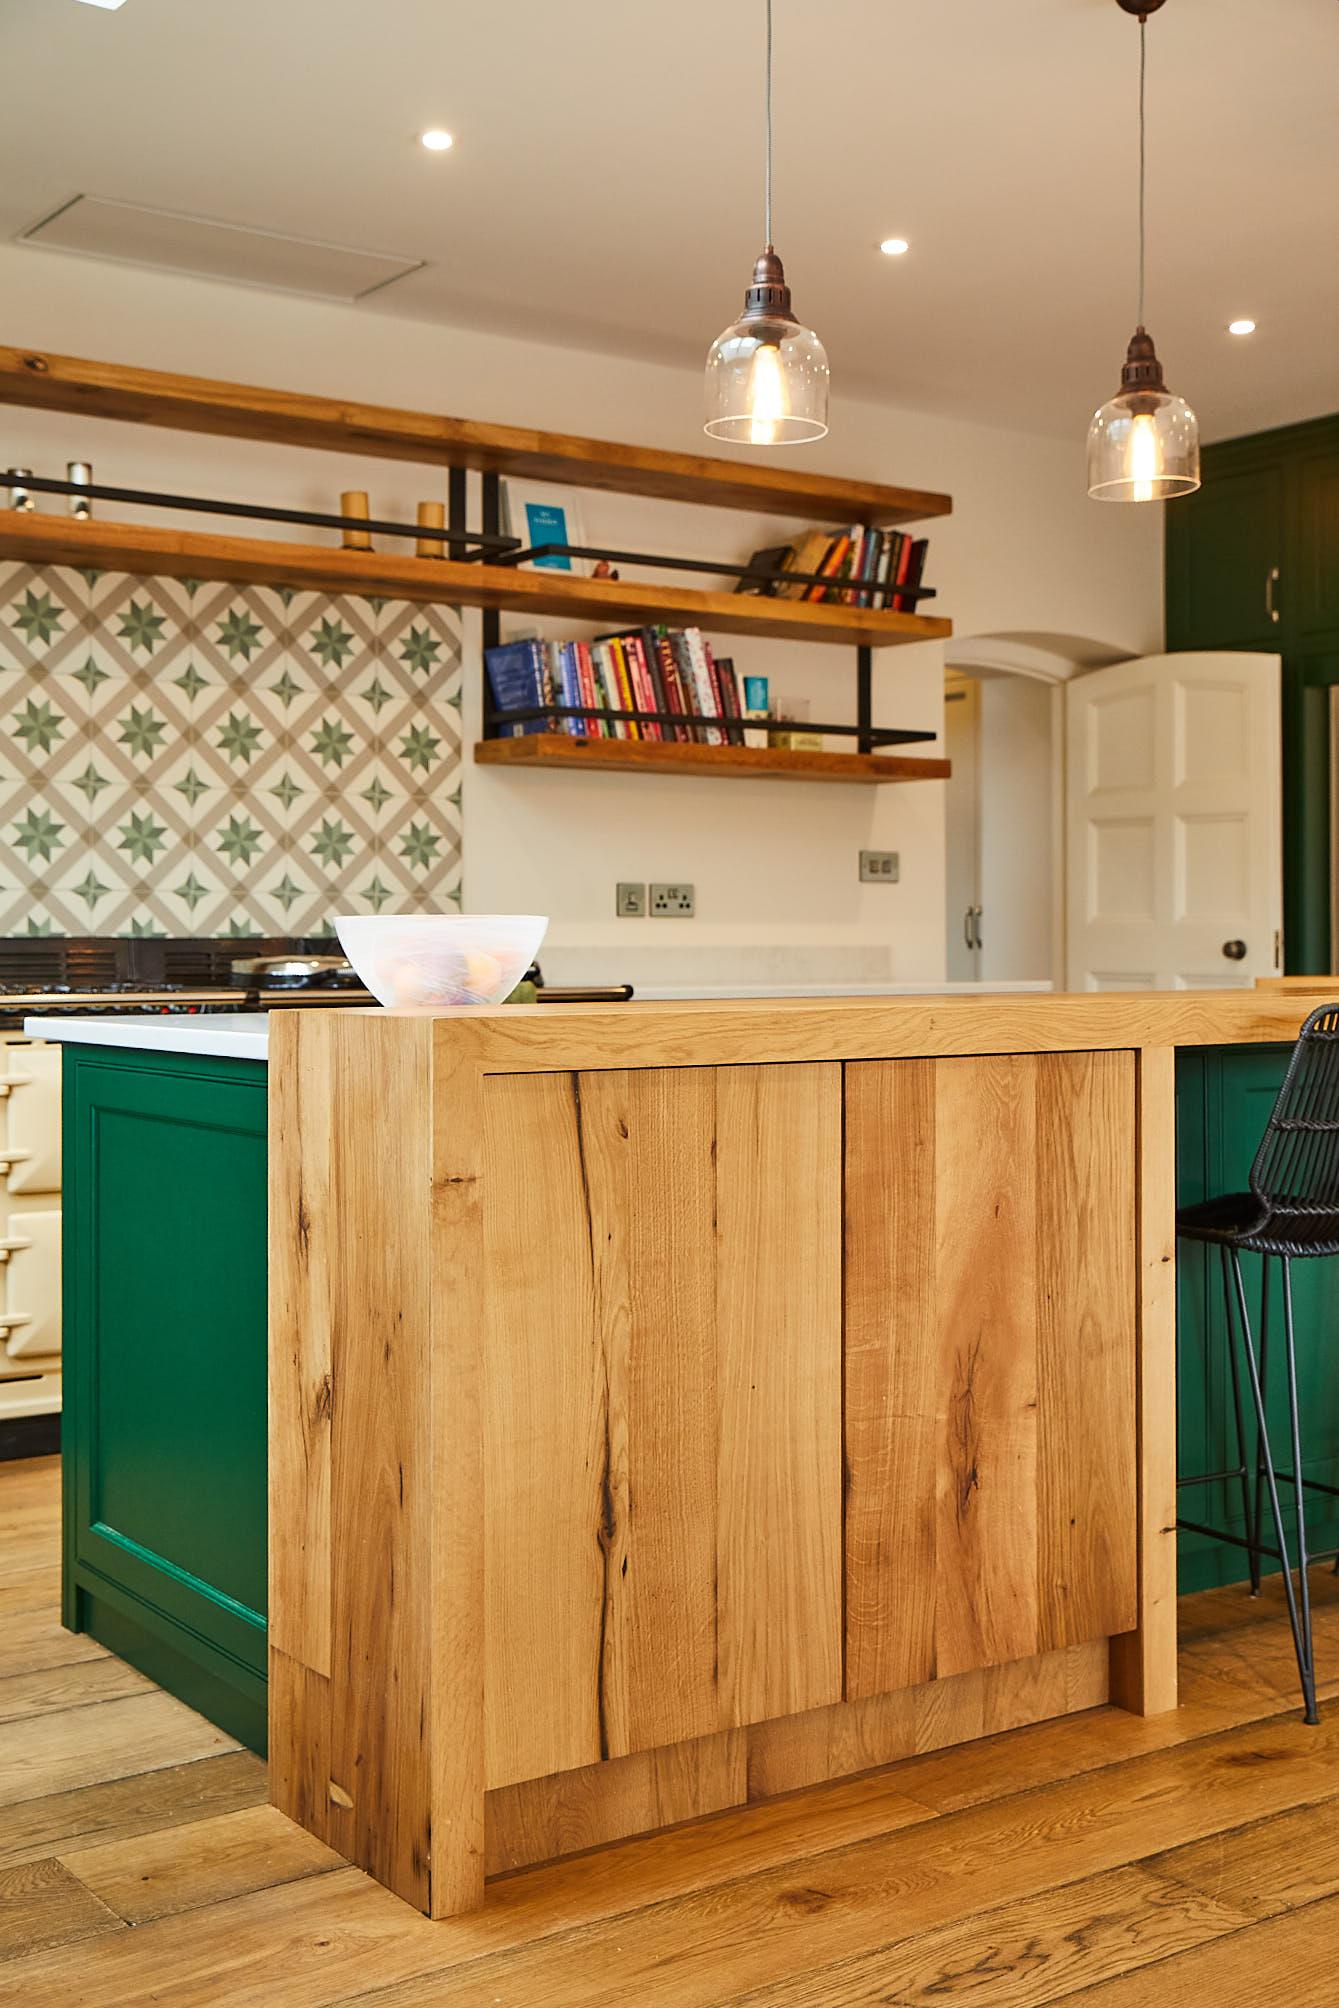 Clean oak wrap around breakfast bar with green kitchen cabinets